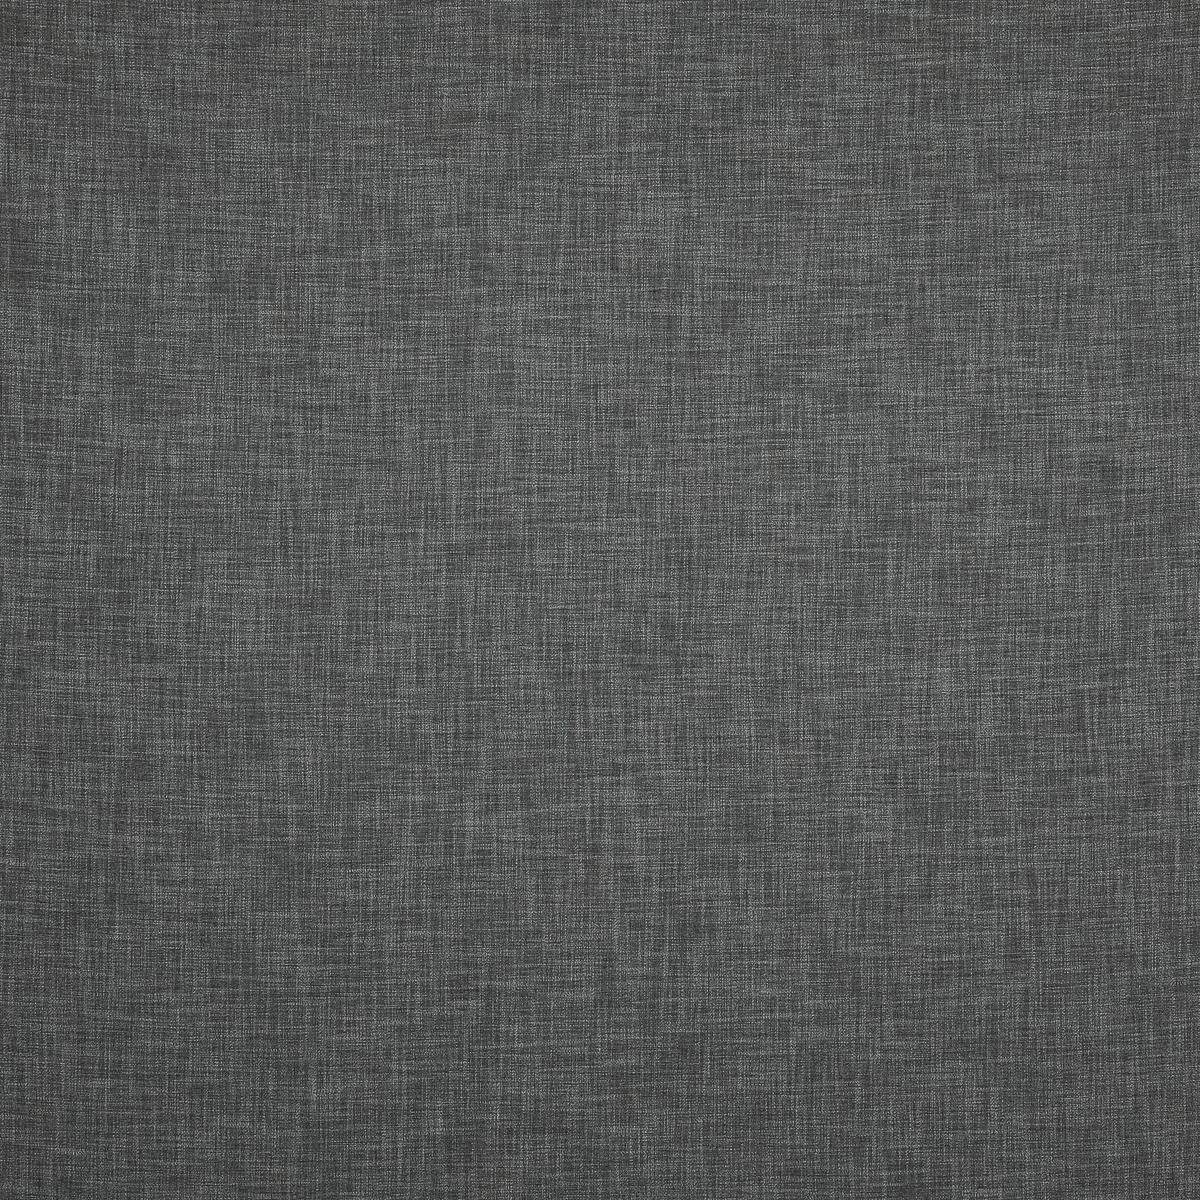 Шерстяная ткань с добавлением шёлка оттенка серый меланж